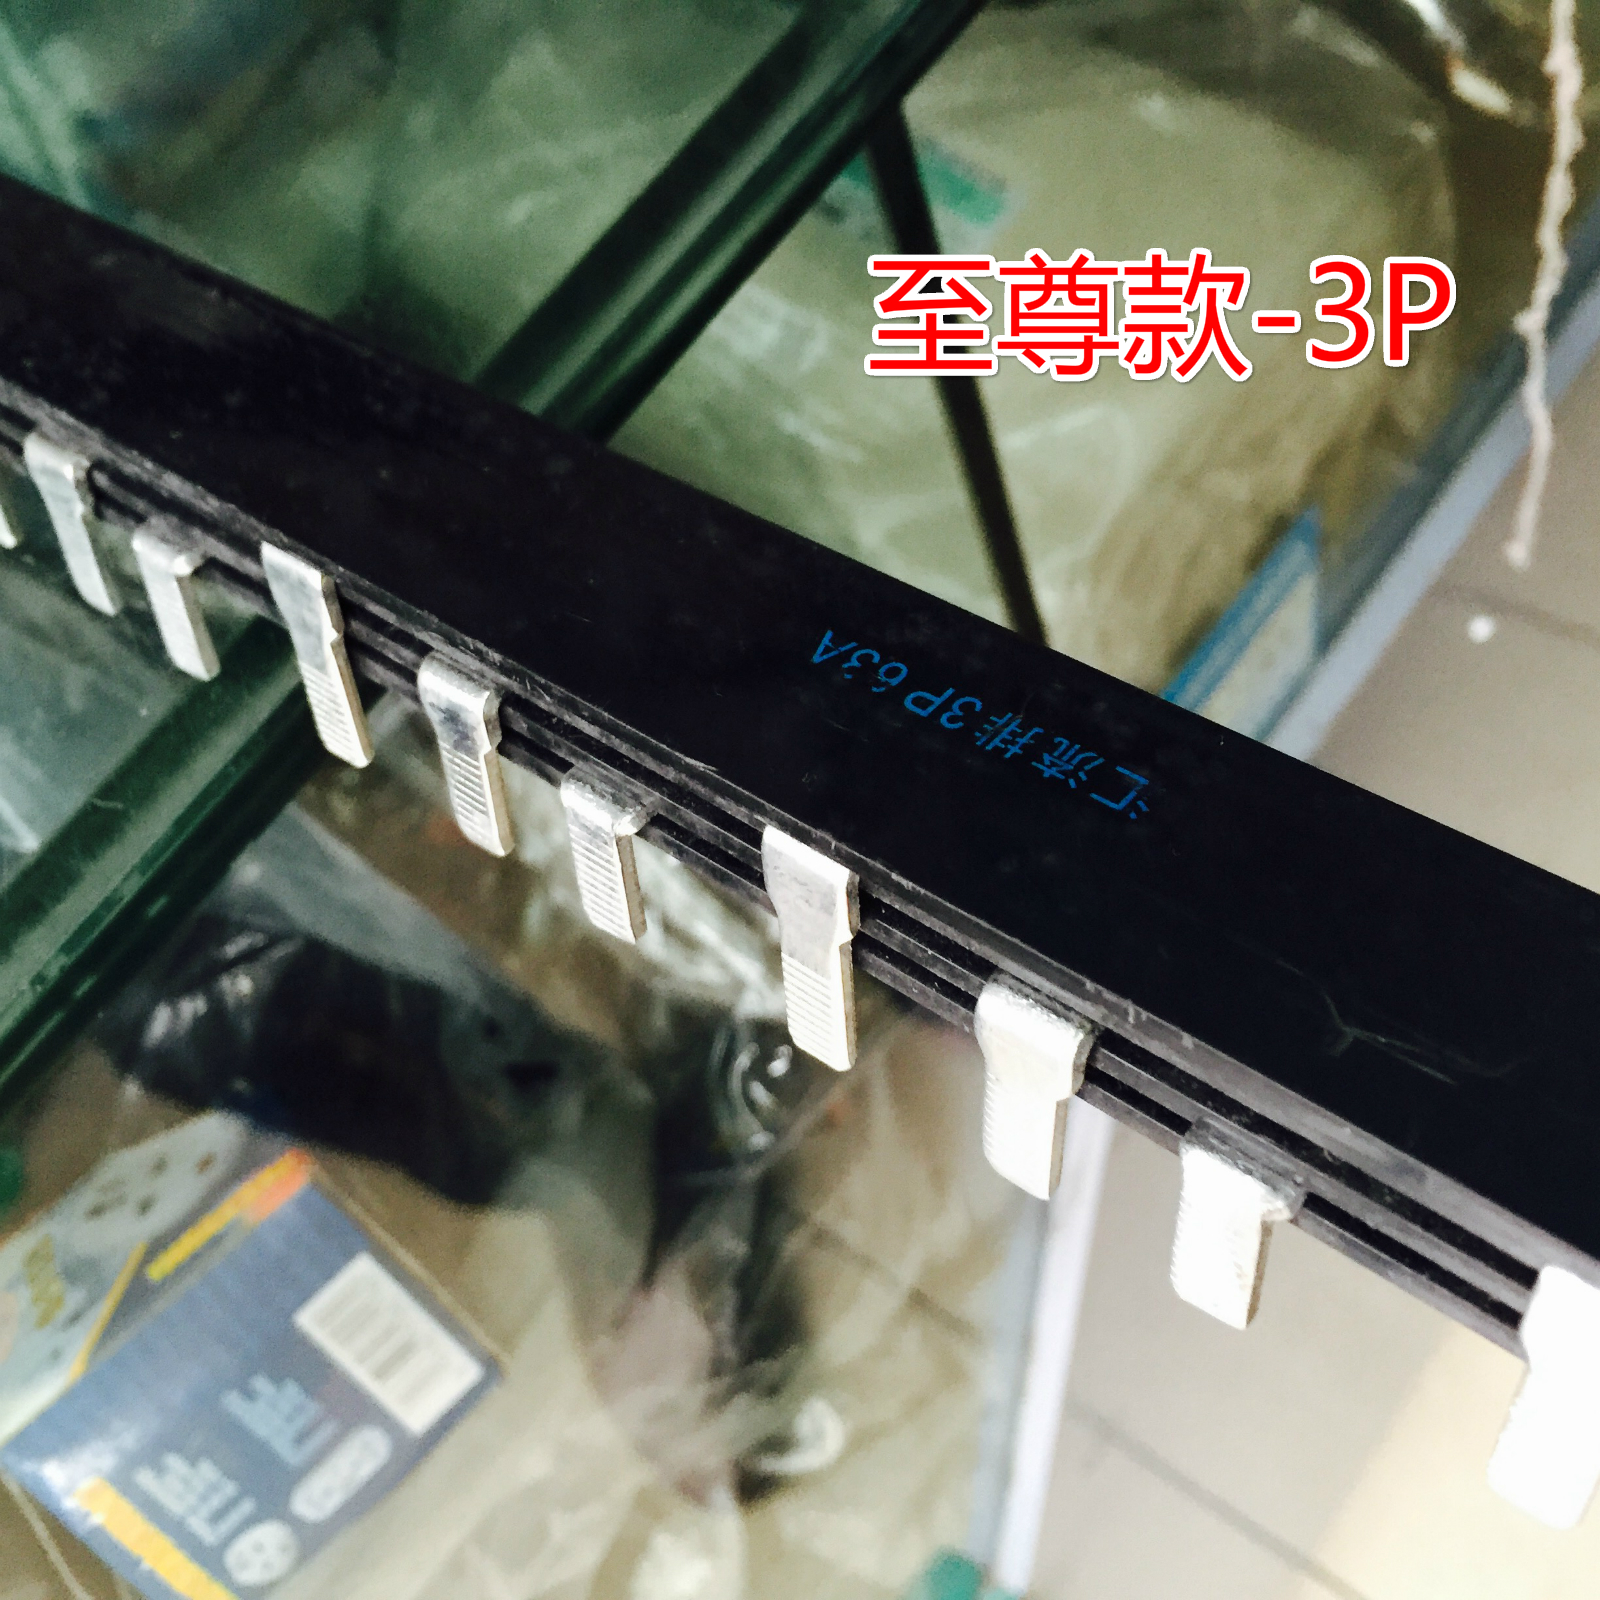 DZ47空气开关汇流排3PC63导流排一个断路器拍一个48926981270799